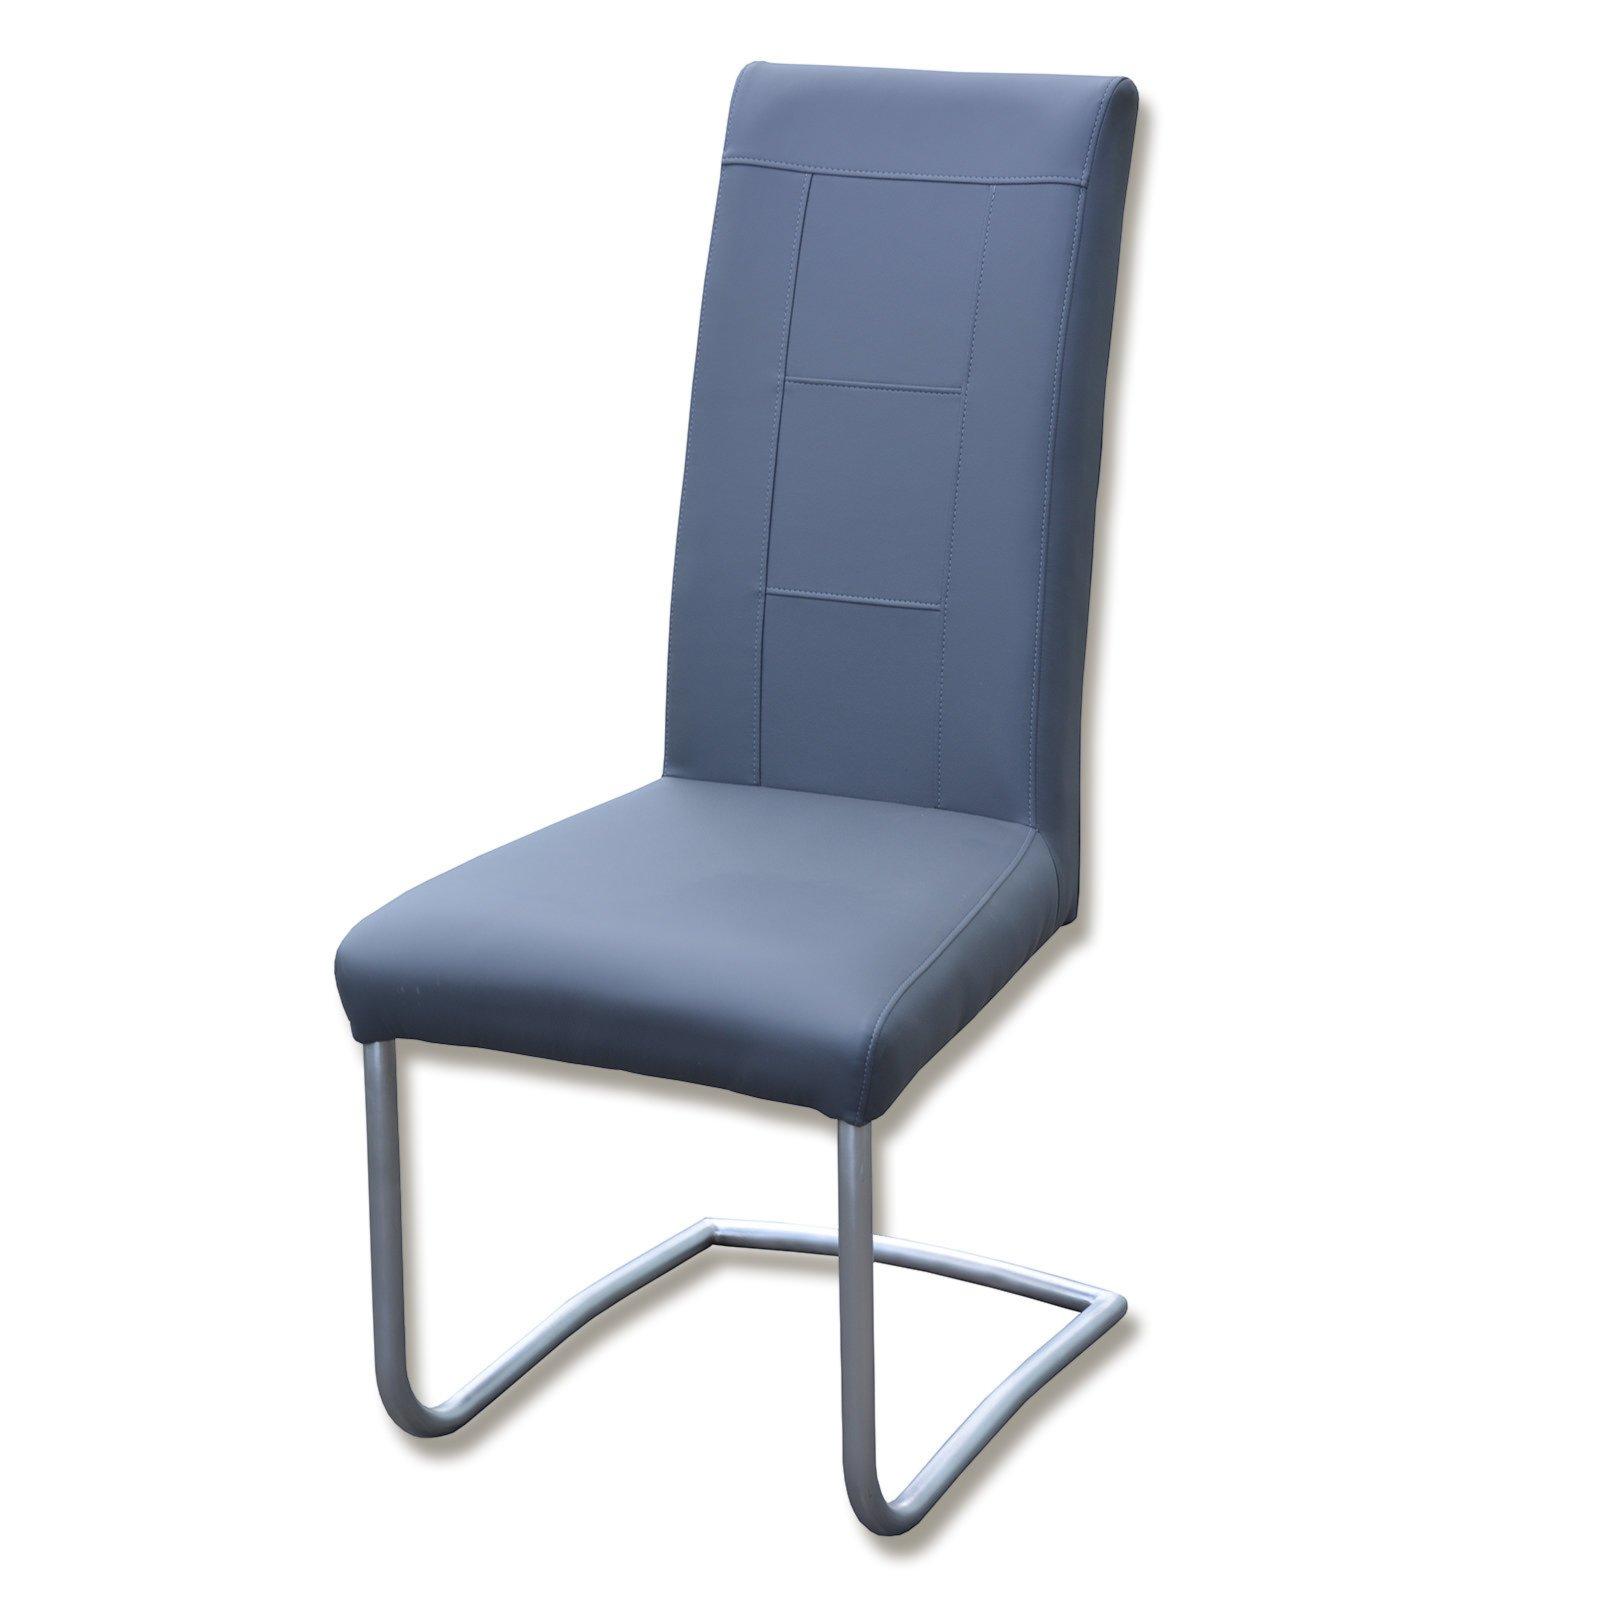 freischwinger axel graublau kunstleder freischwinger. Black Bedroom Furniture Sets. Home Design Ideas